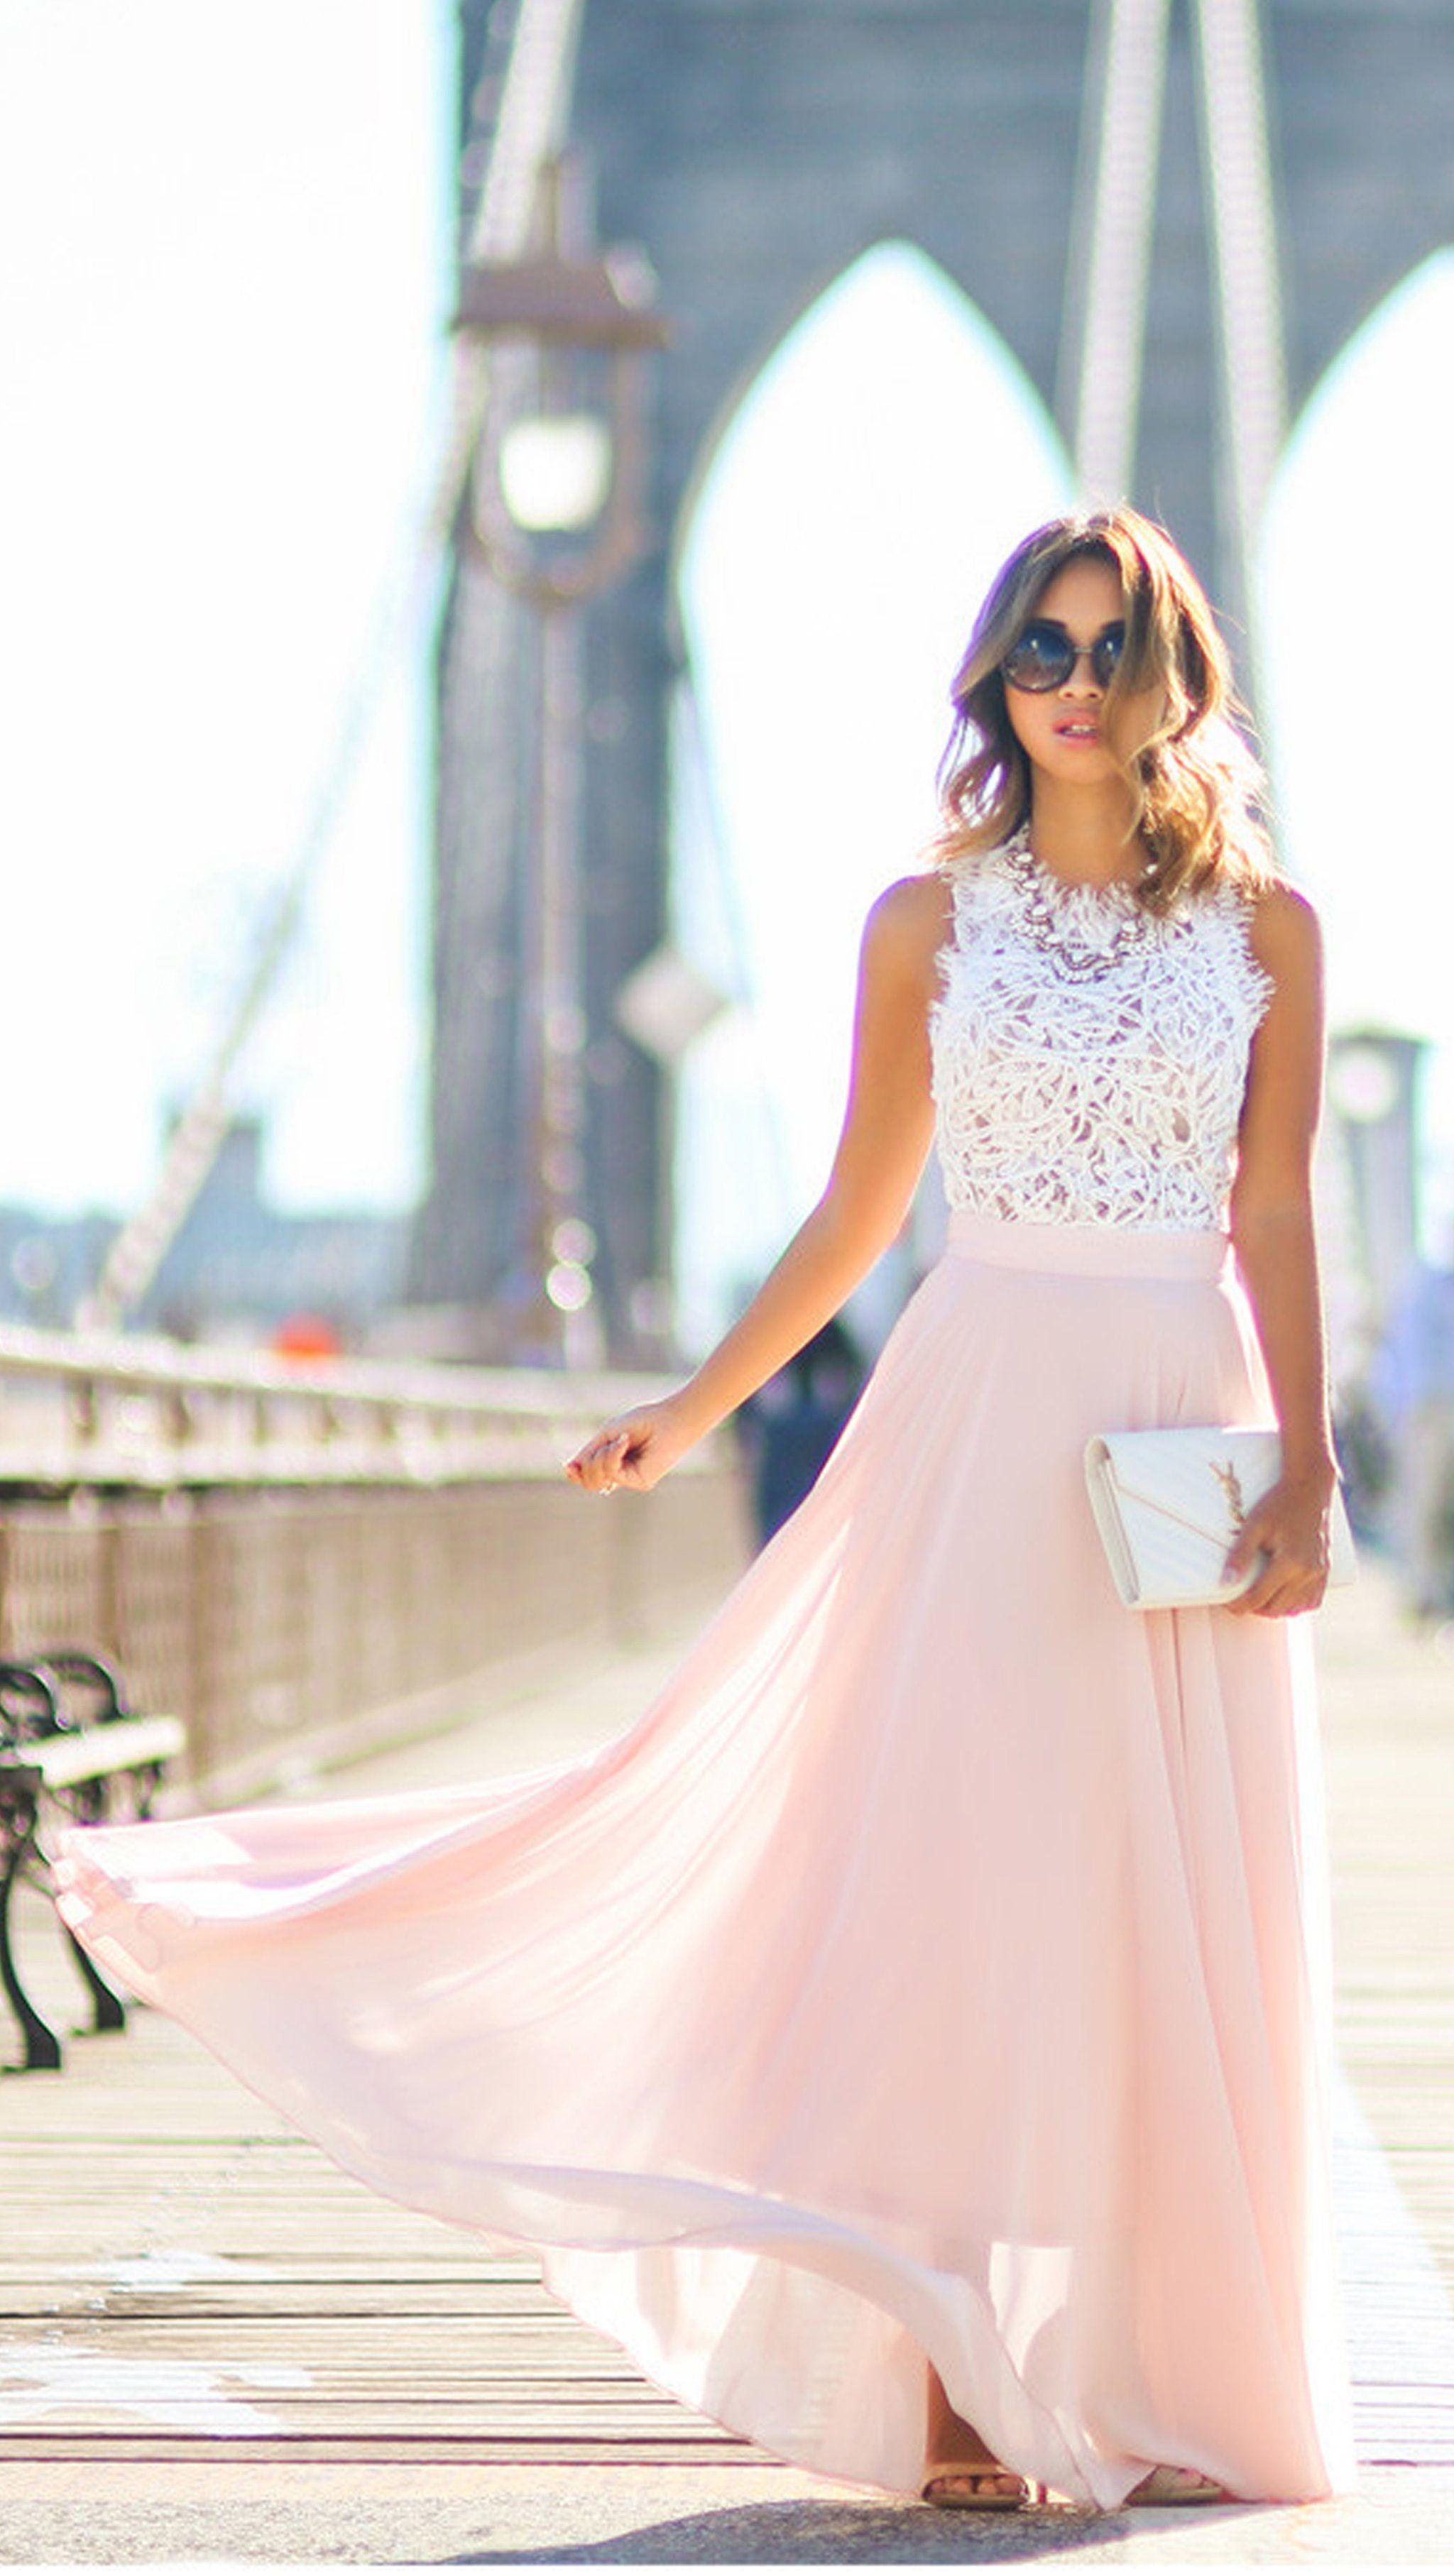 07bbda37ba Long Prom Dresses Lace Maxi Chiffon Dress Elegant Spring Graduation Outfit  Ideas for Teens in Pink, Blue, Purple - hermosos vestidos de fiesta para ...